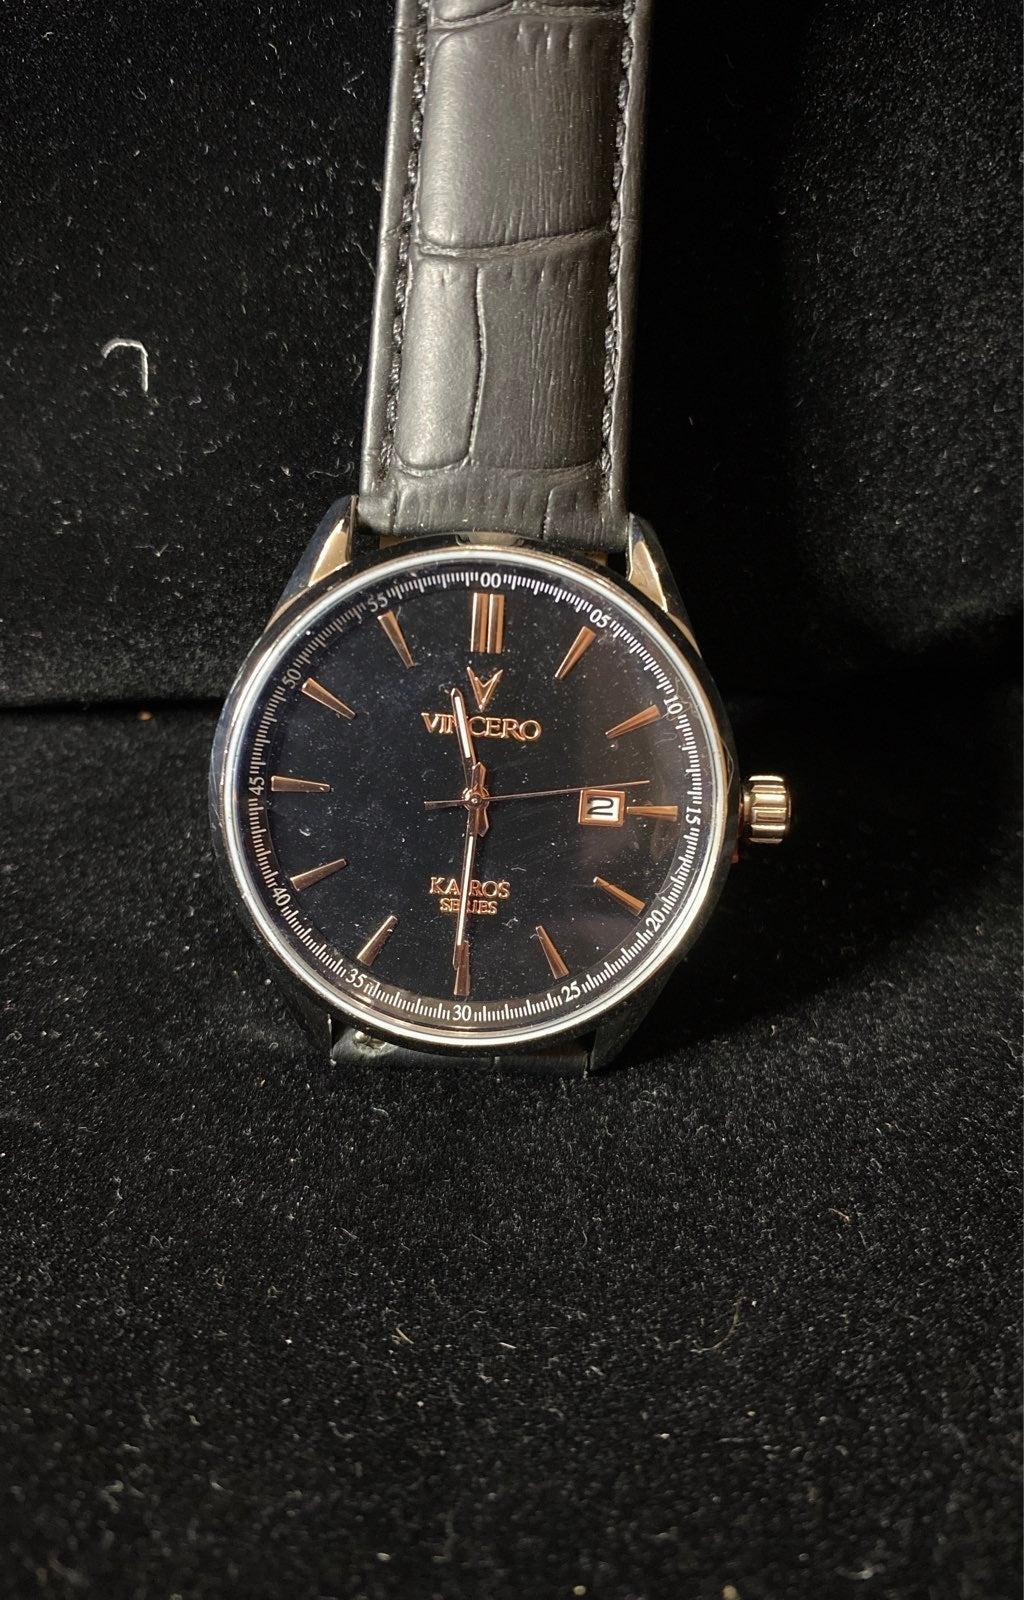 Vincero Men's Watch - The Kairos